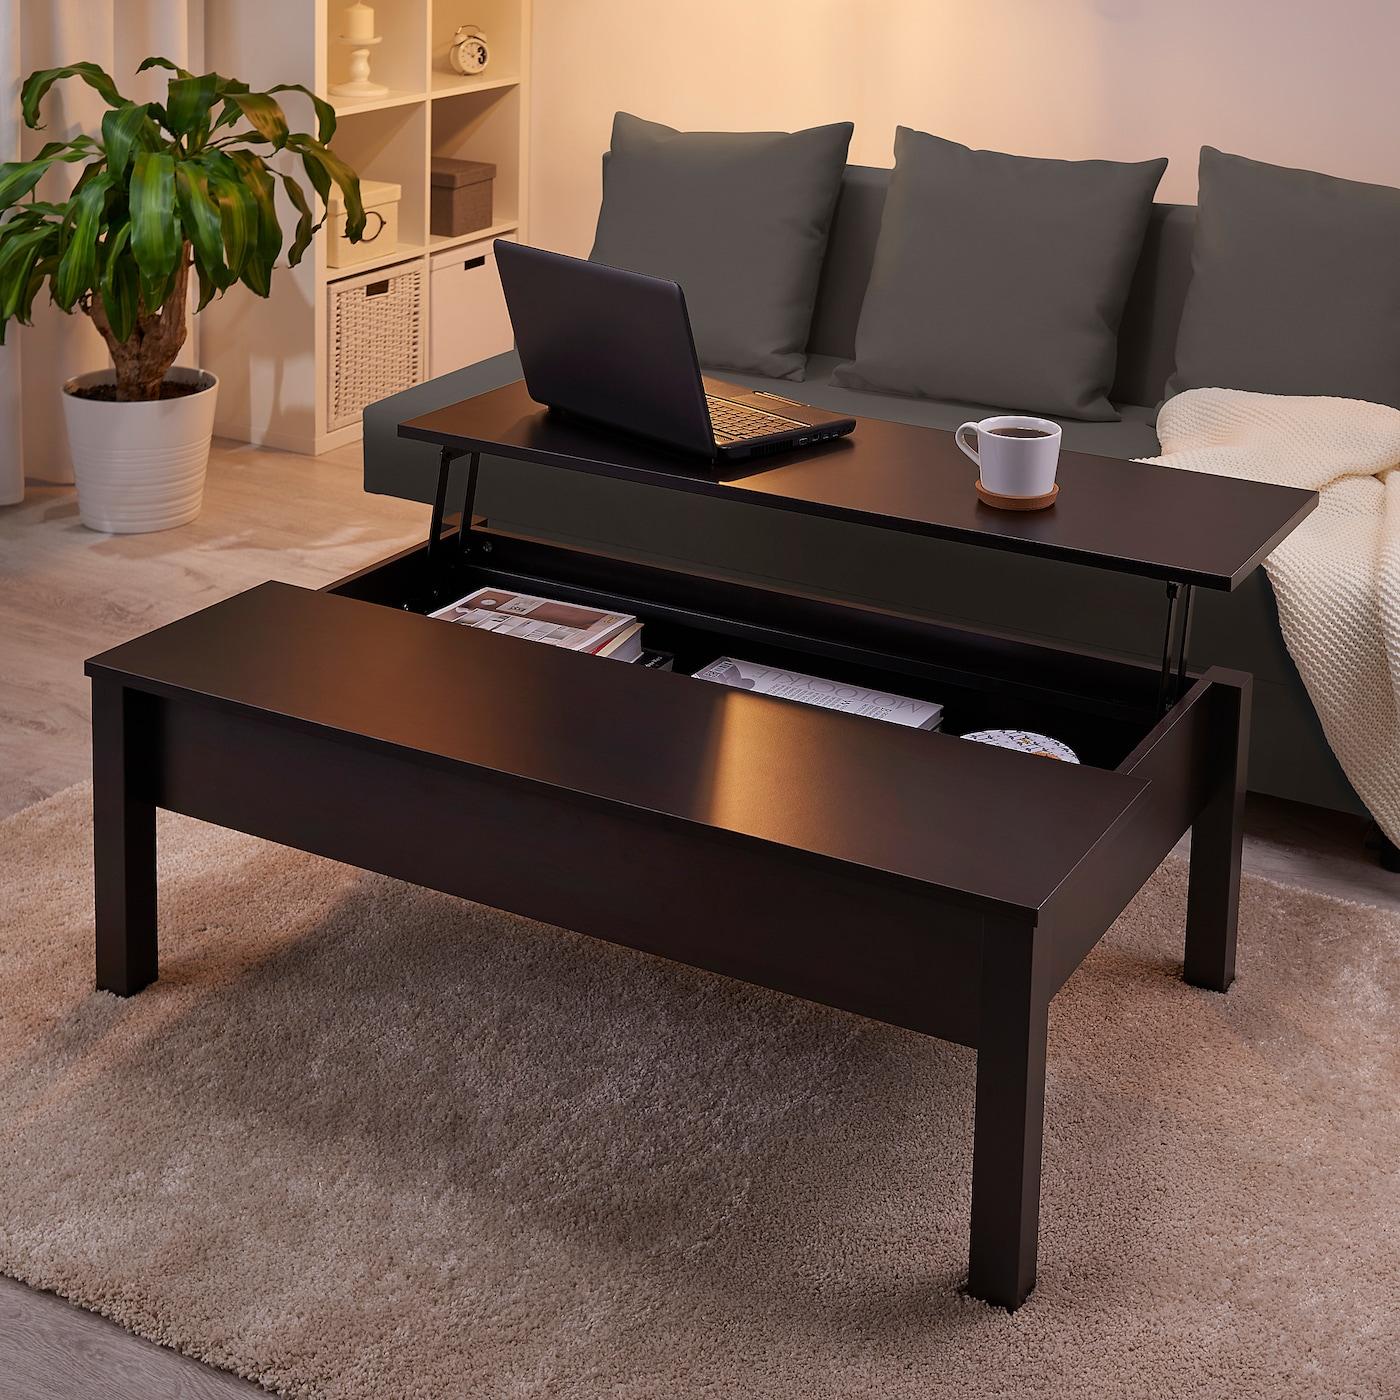 Trulstorp Black Brown Coffee Table 115x70 Cm Ikea